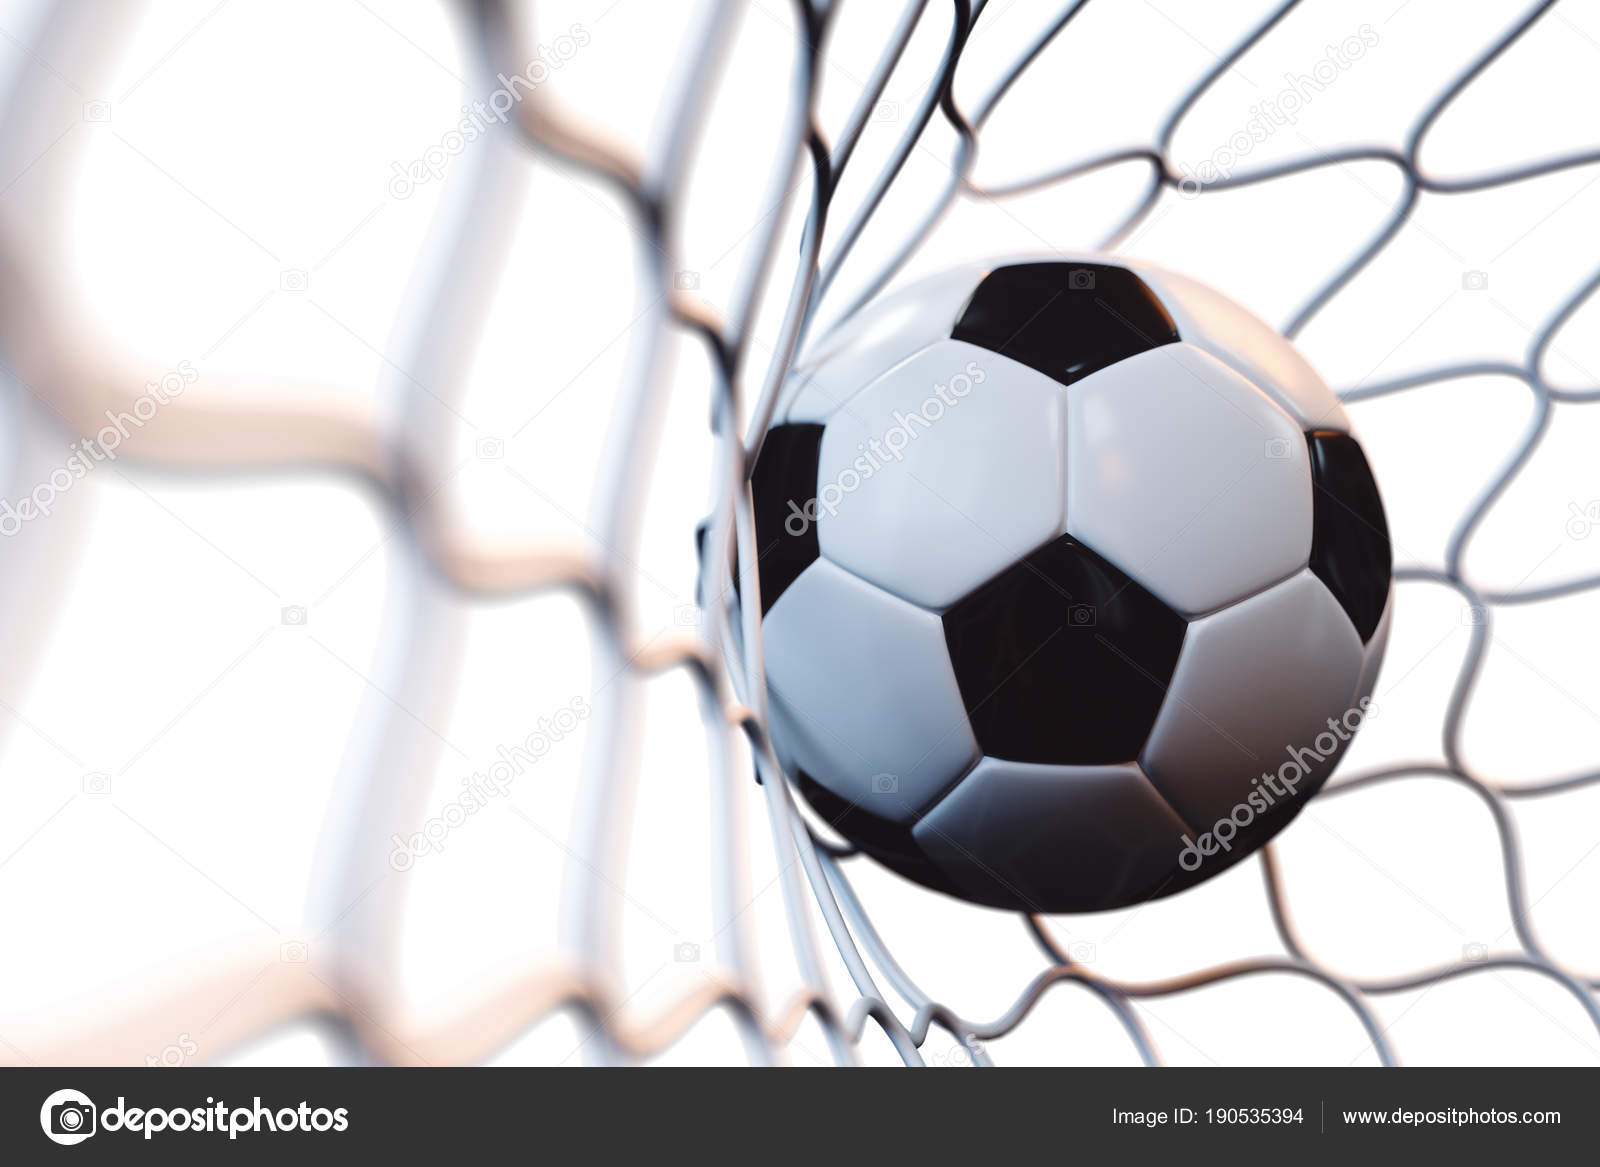 3d rendering soccer ball in goal in motion. Soccer ball in net in motion  isolated on white background d060f5968effd